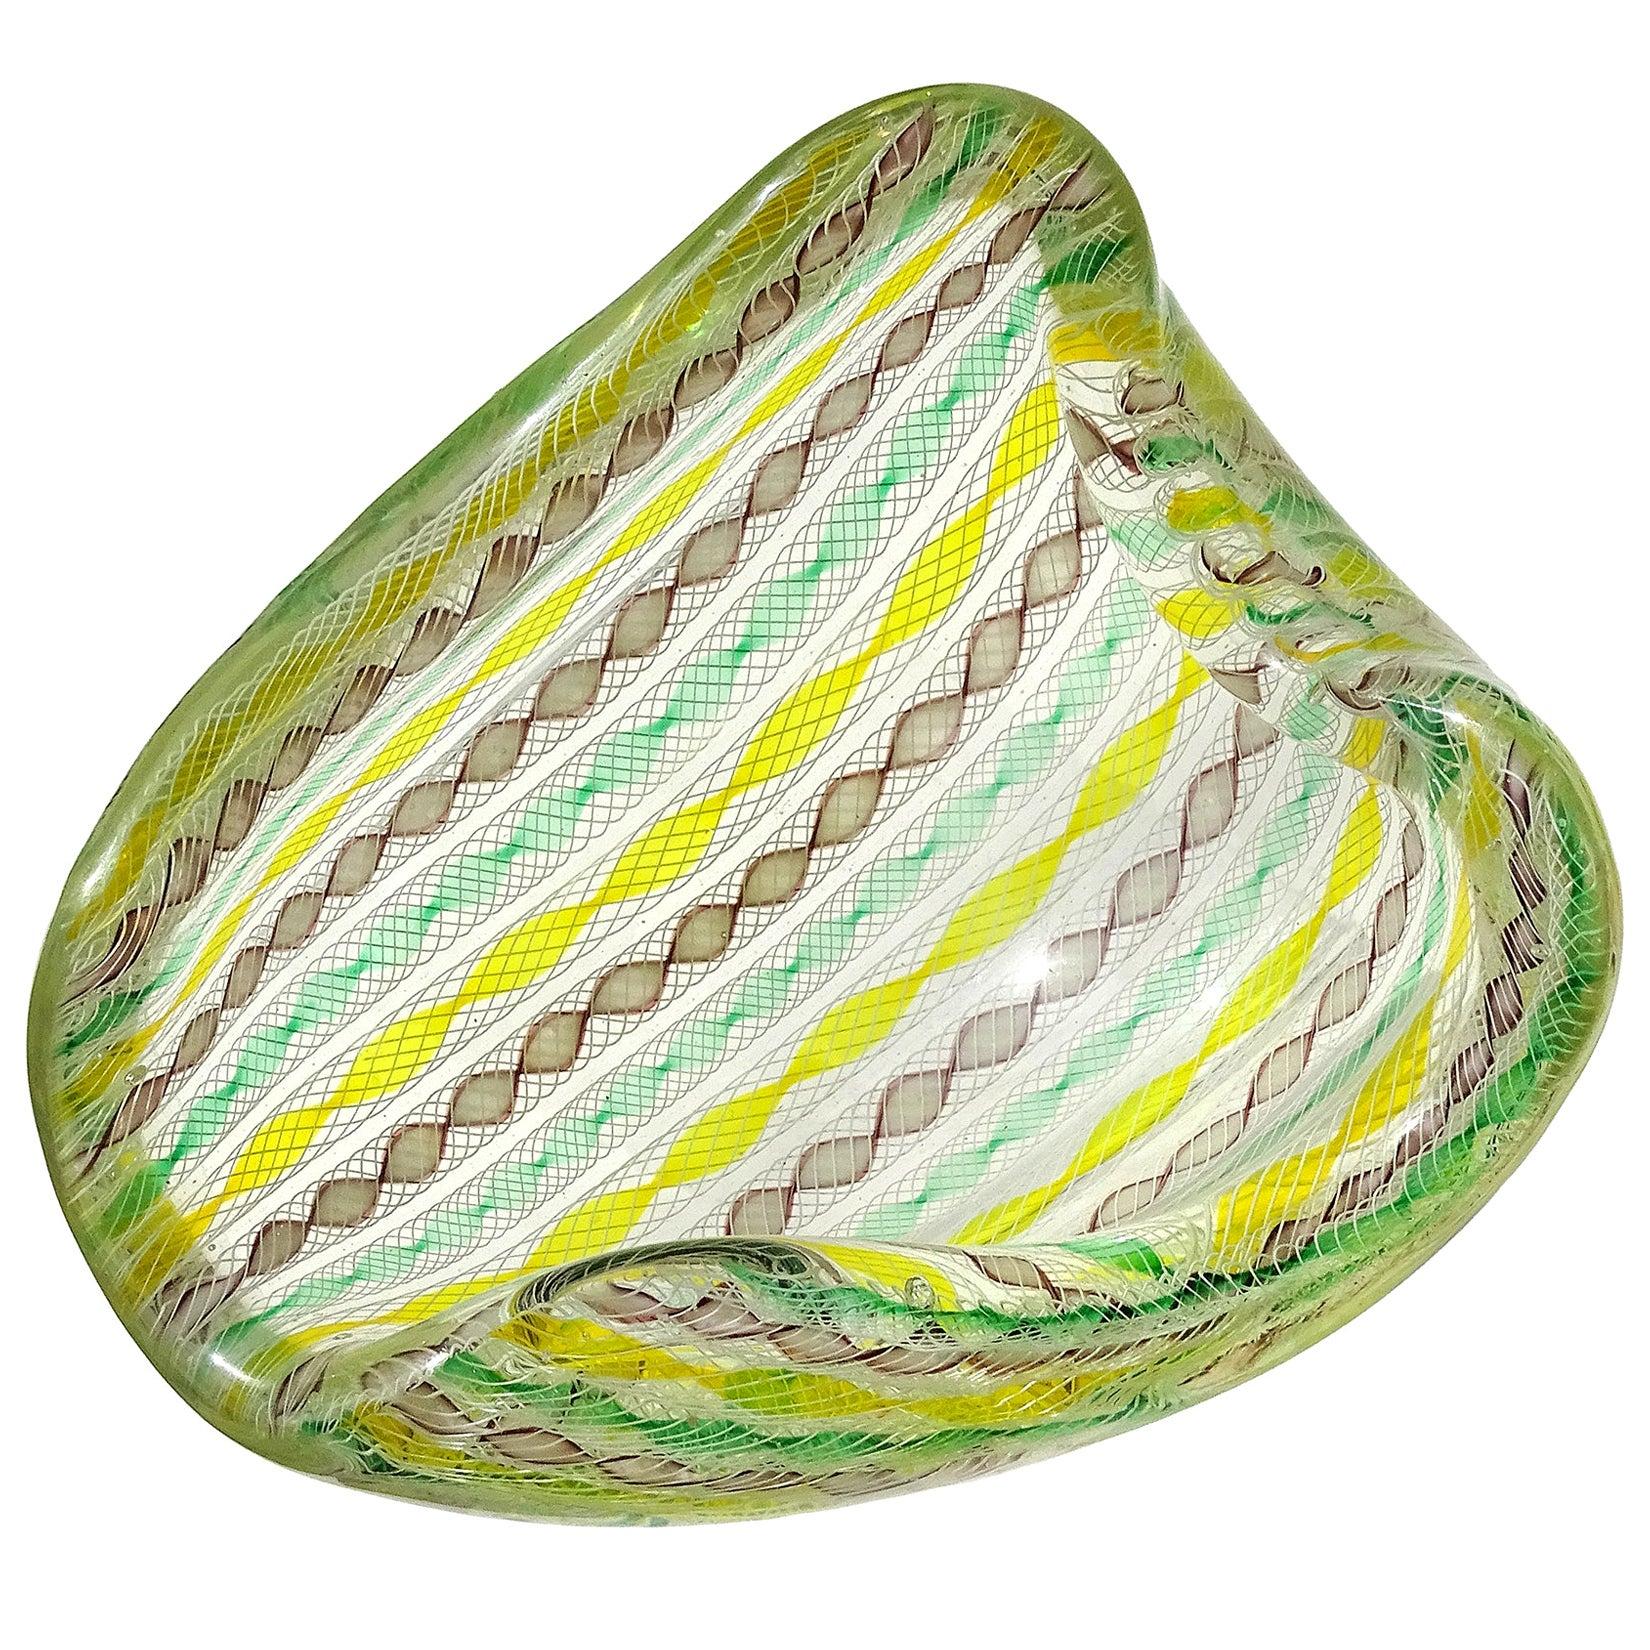 Seguso Murano Yellow Green Purple White Twisting Ribbons Italian Art Glass Bowl